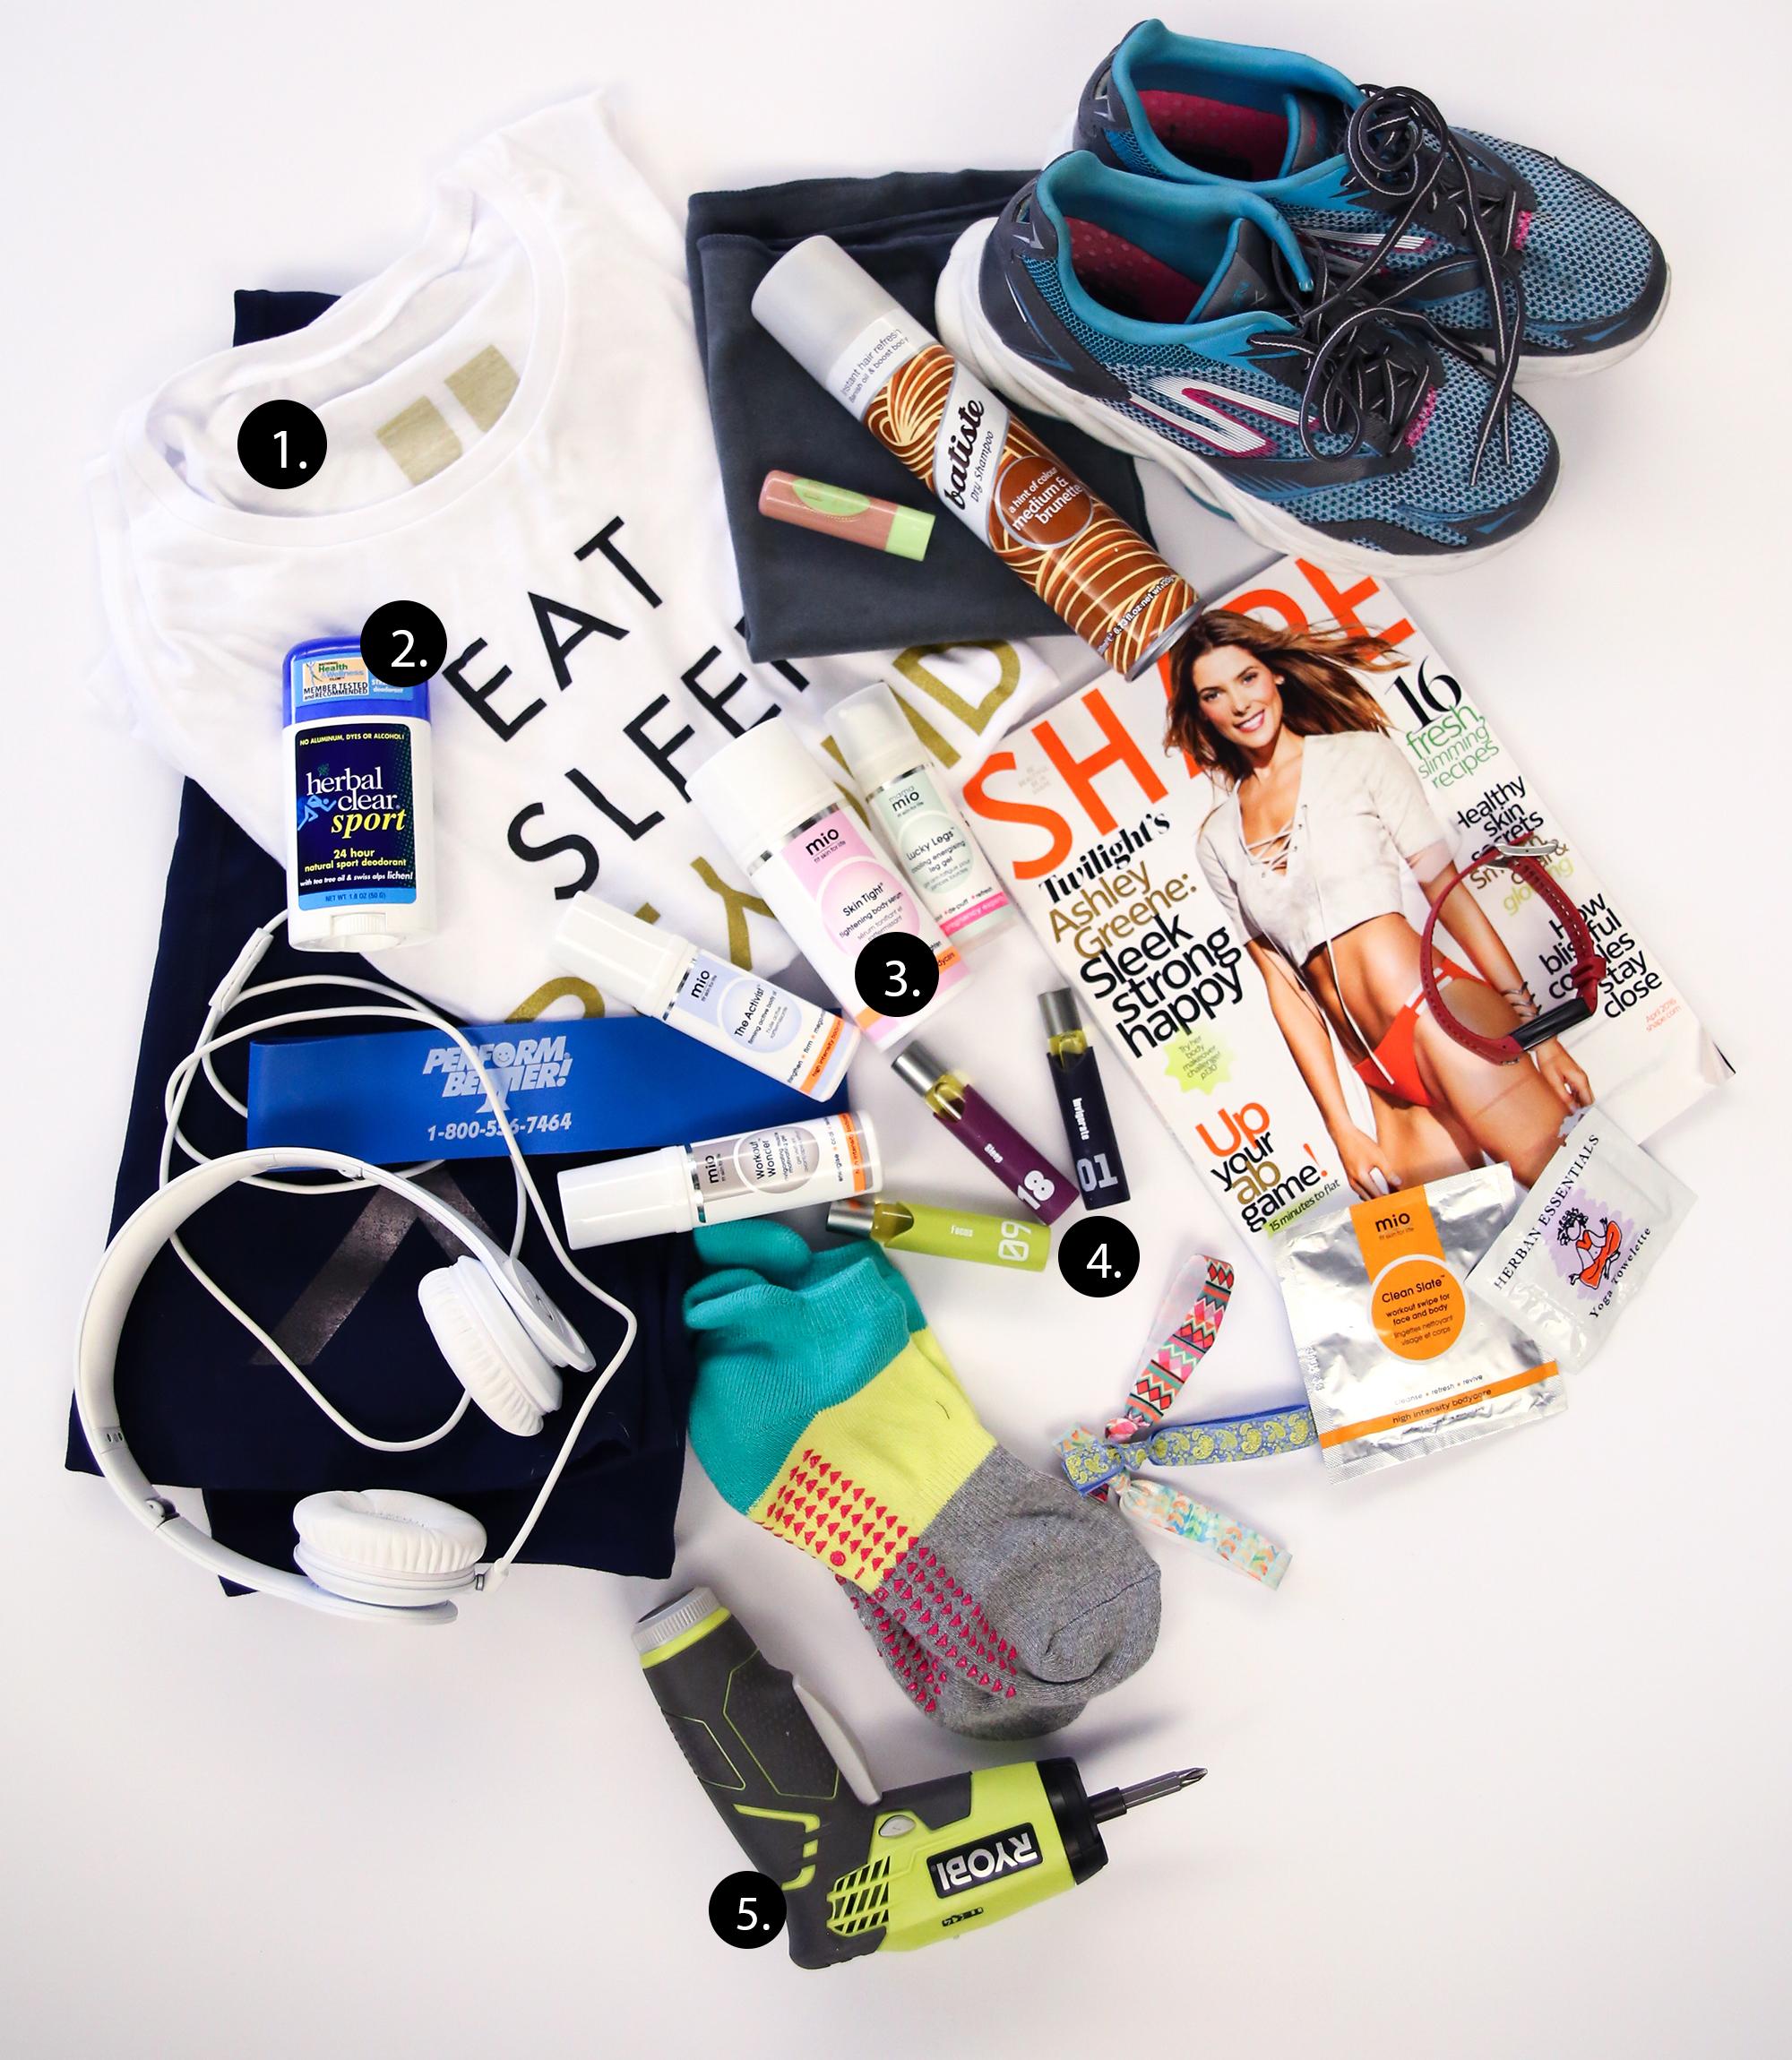 Gym Bag Spill D Magazine